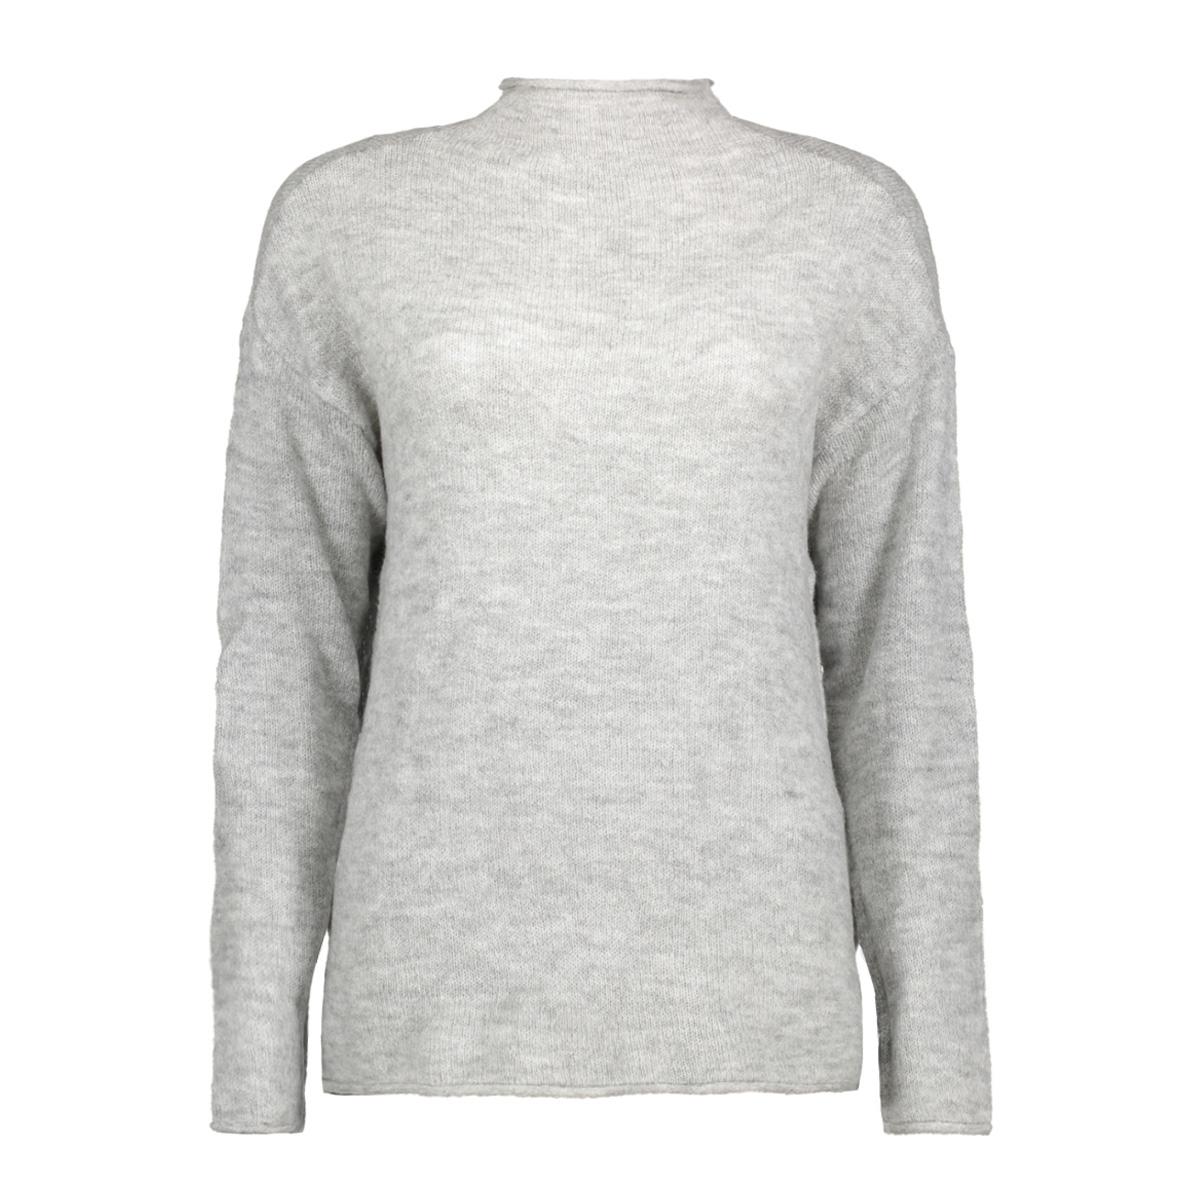 jdyalice l/s pullover knt 15137104 jacqueline de yong trui light grey melange